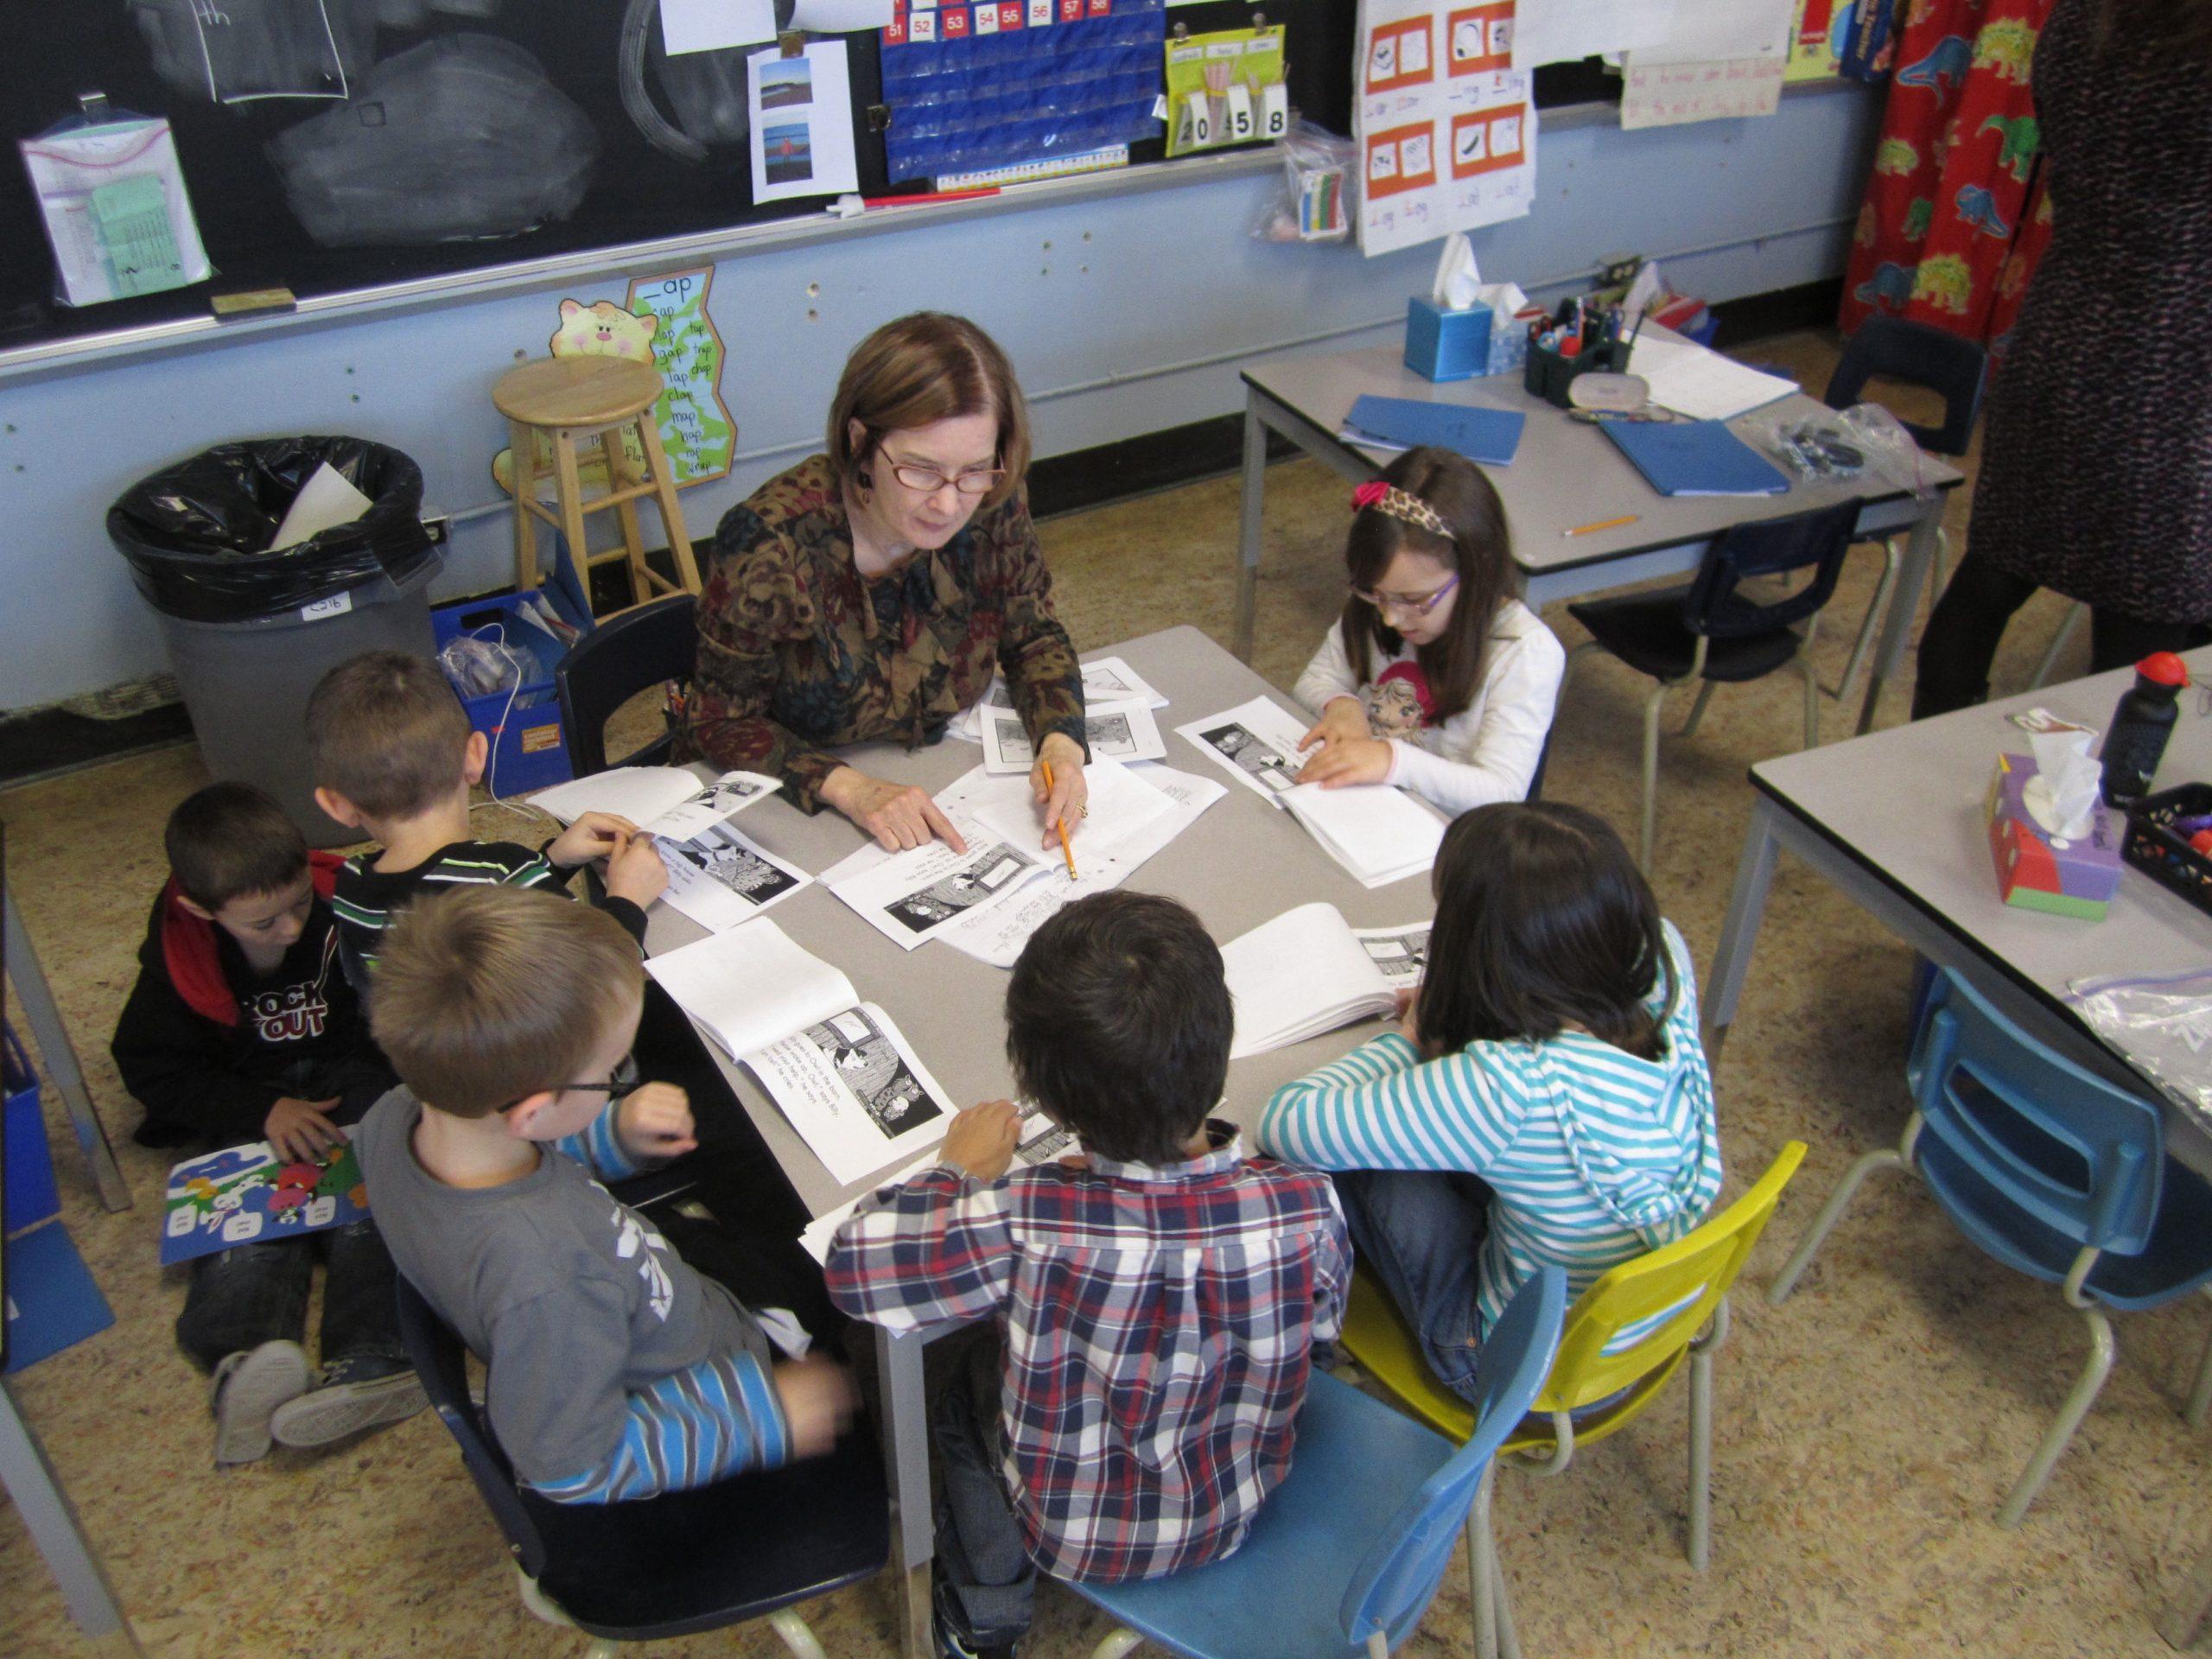 Teacher Profile: An interview with Cycle 1 teacher Mary Ellen Lynch